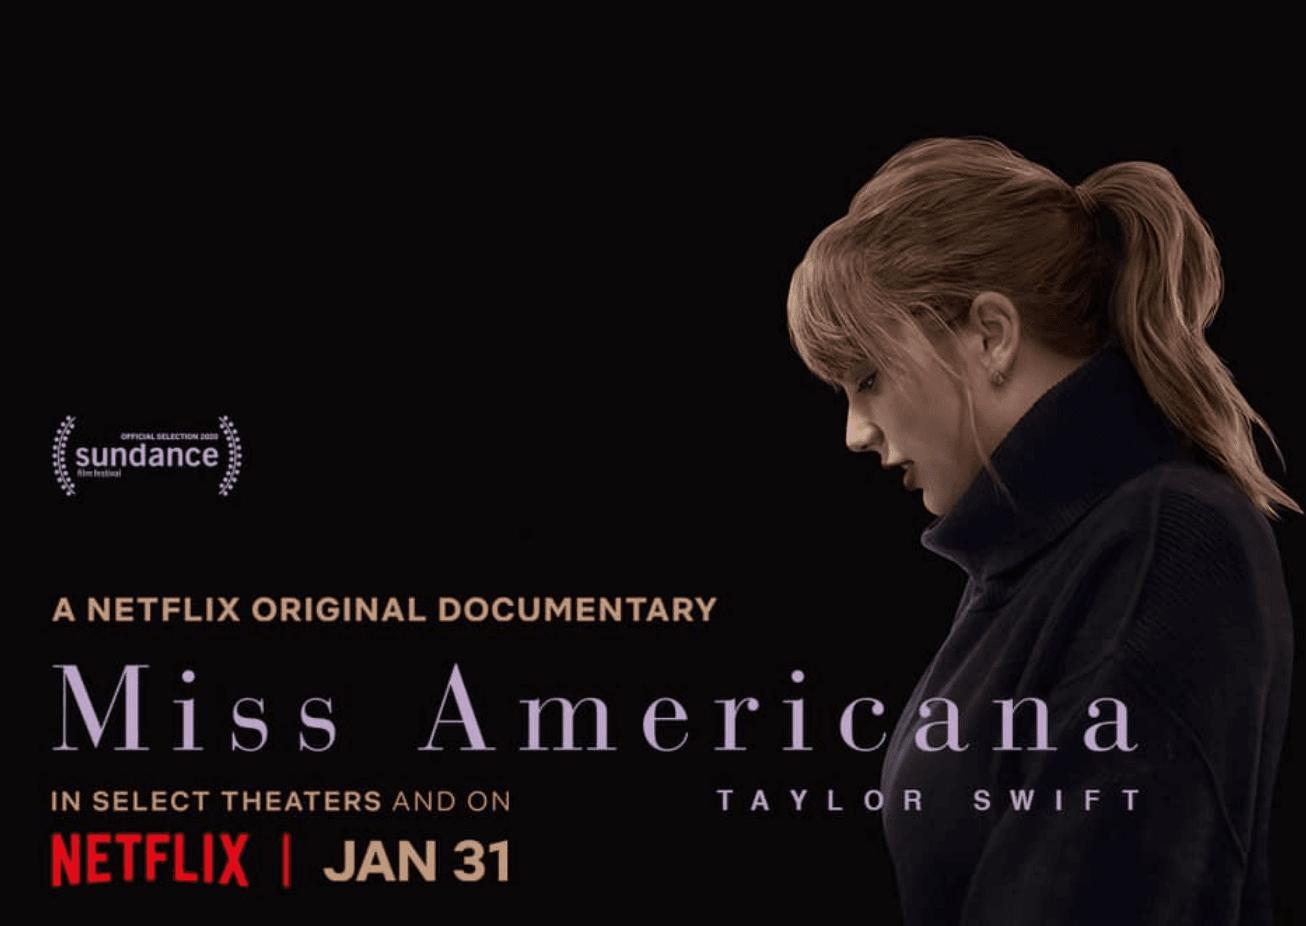 Miss Americana Taylor Swift